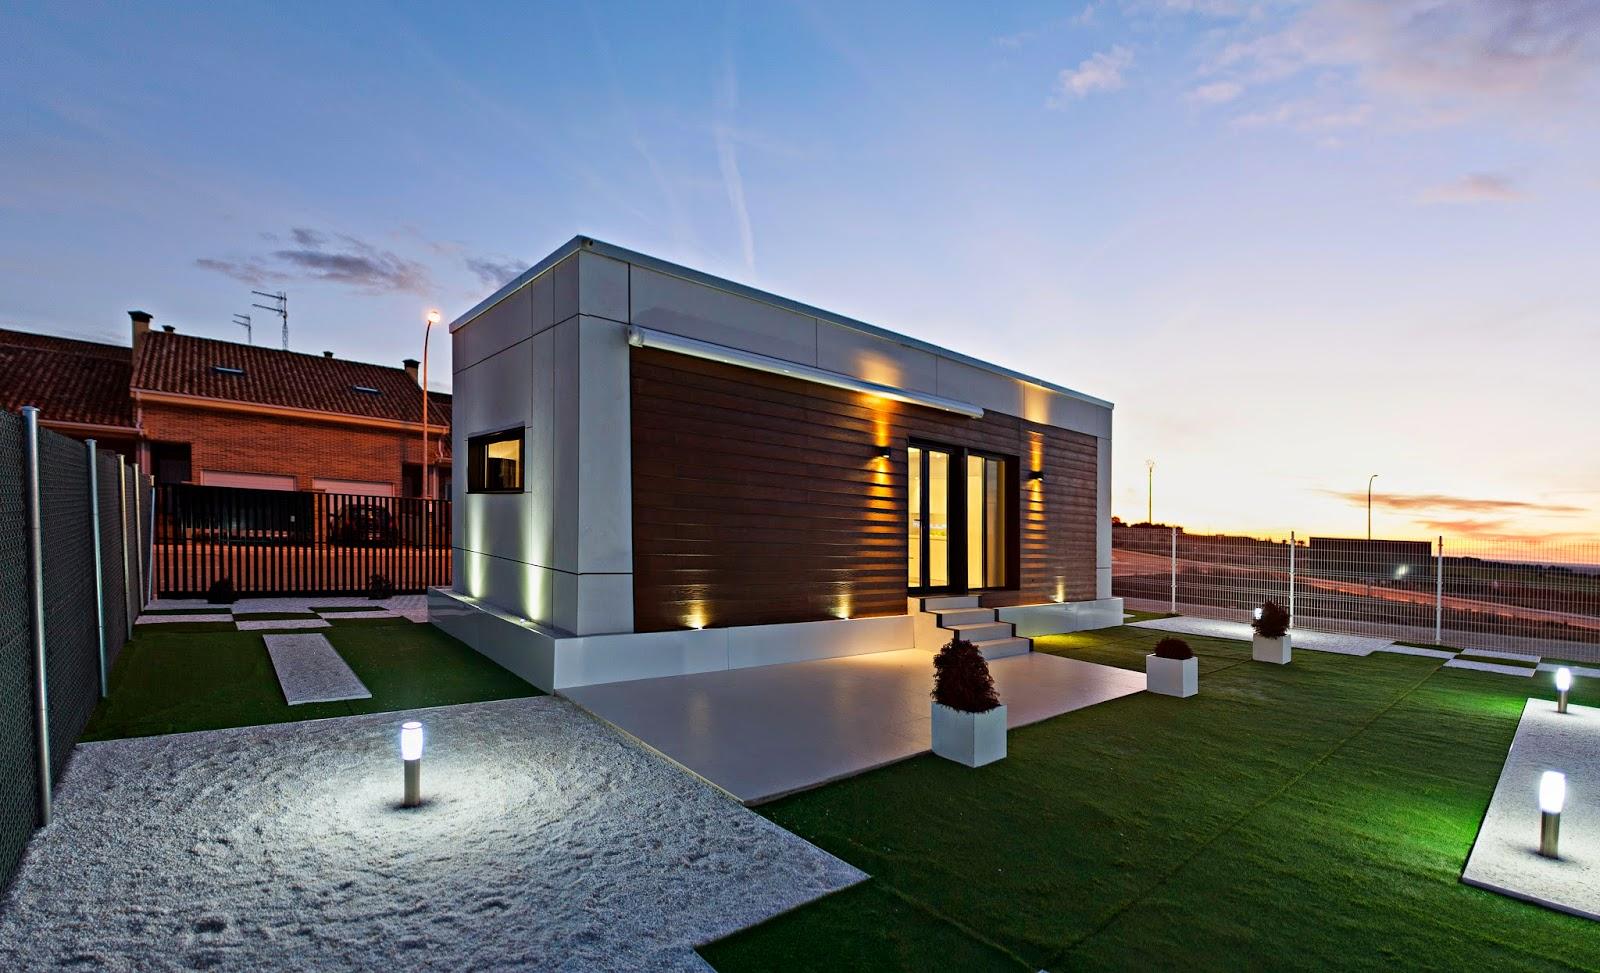 Vivienda modular modelo loft Resan vista nocturna